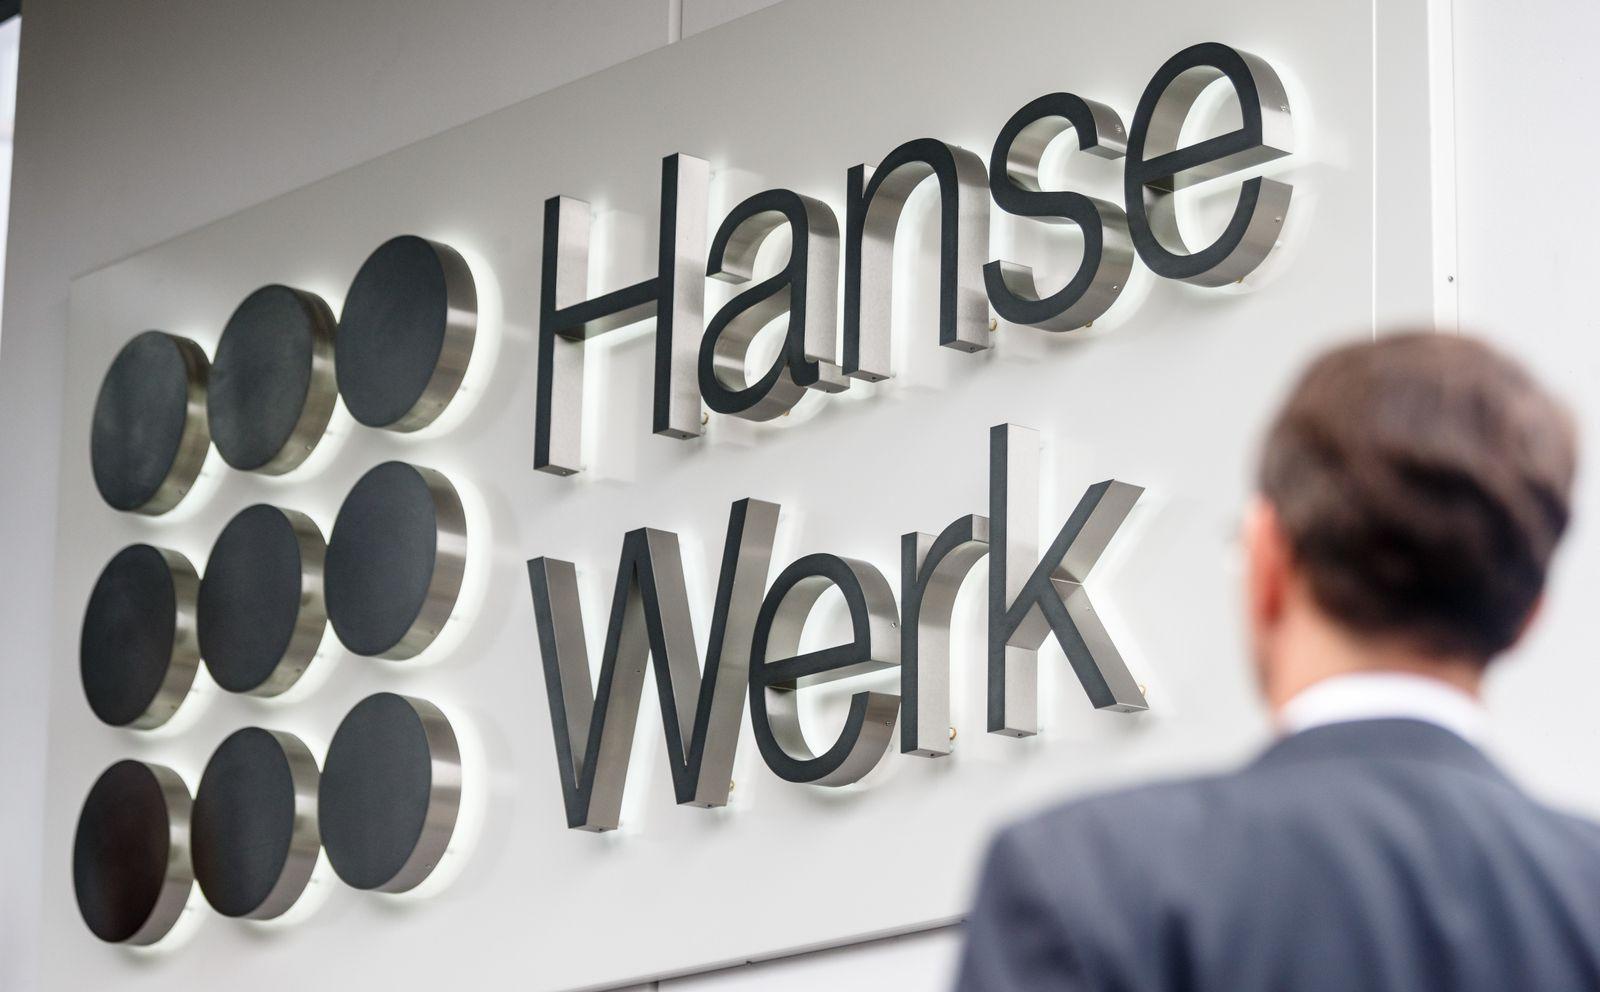 HanseWerk